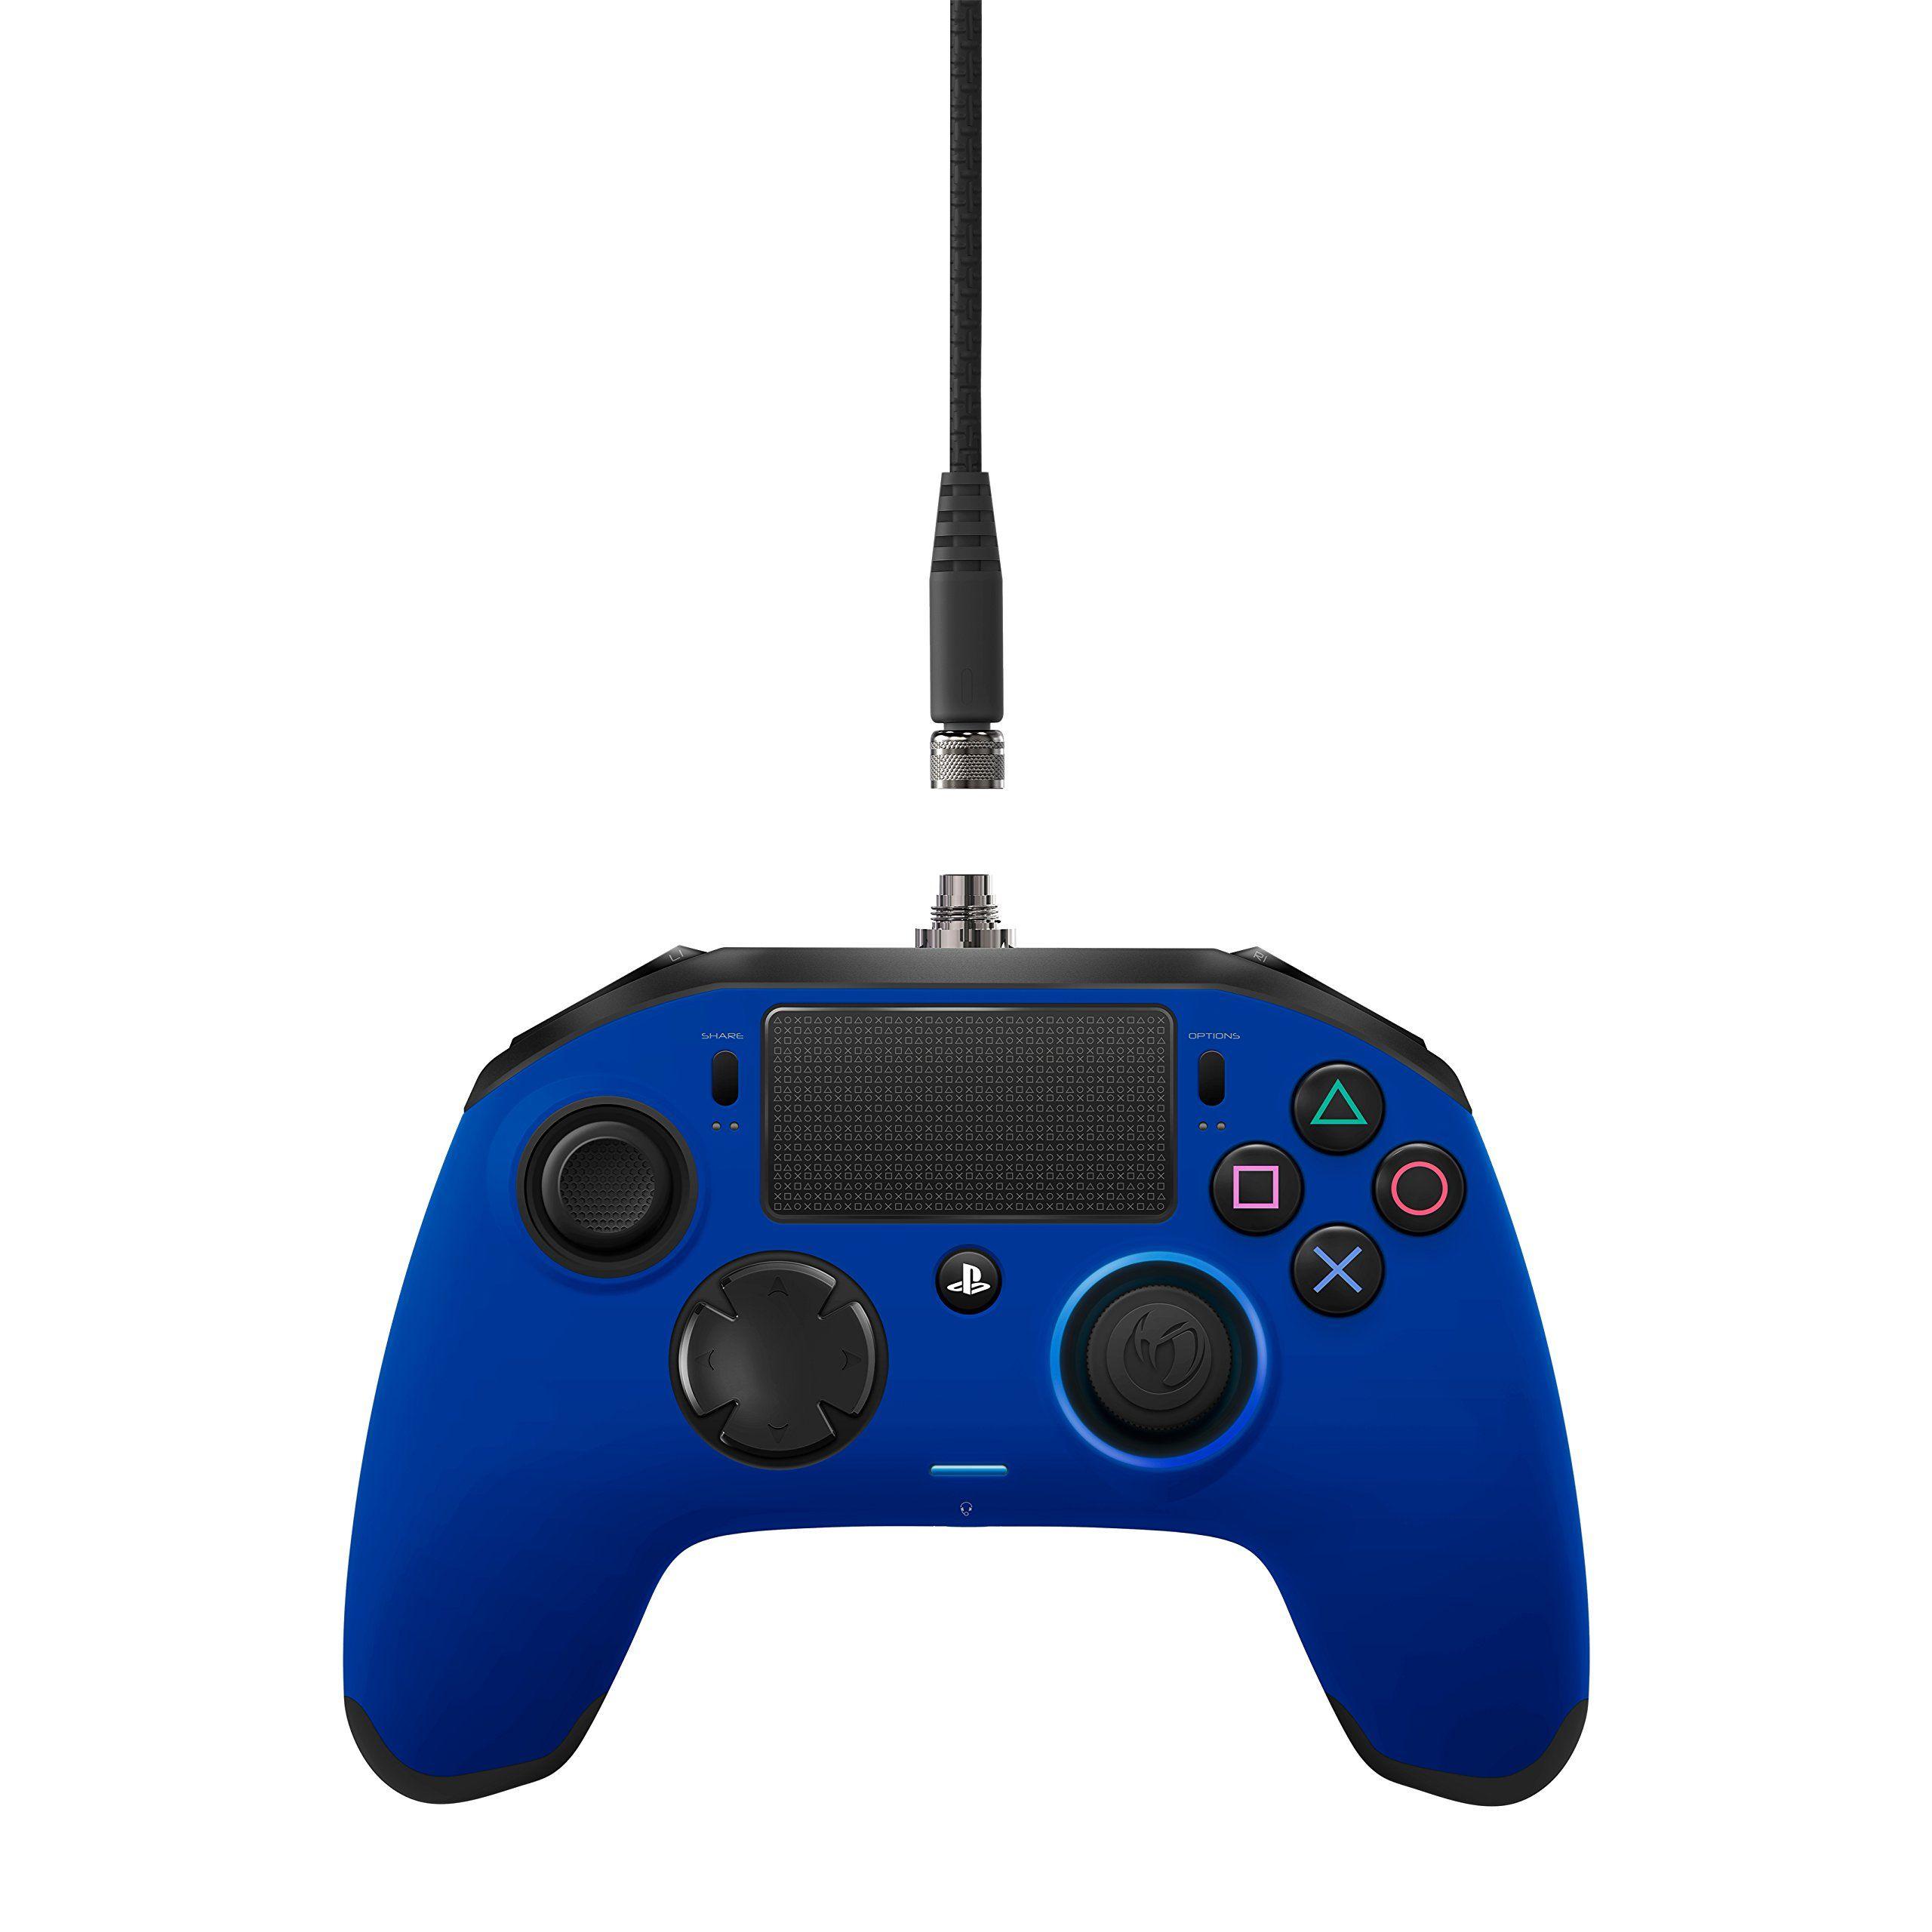 NACON Revolution PRO Controller Gamepad Blue Edition PS4